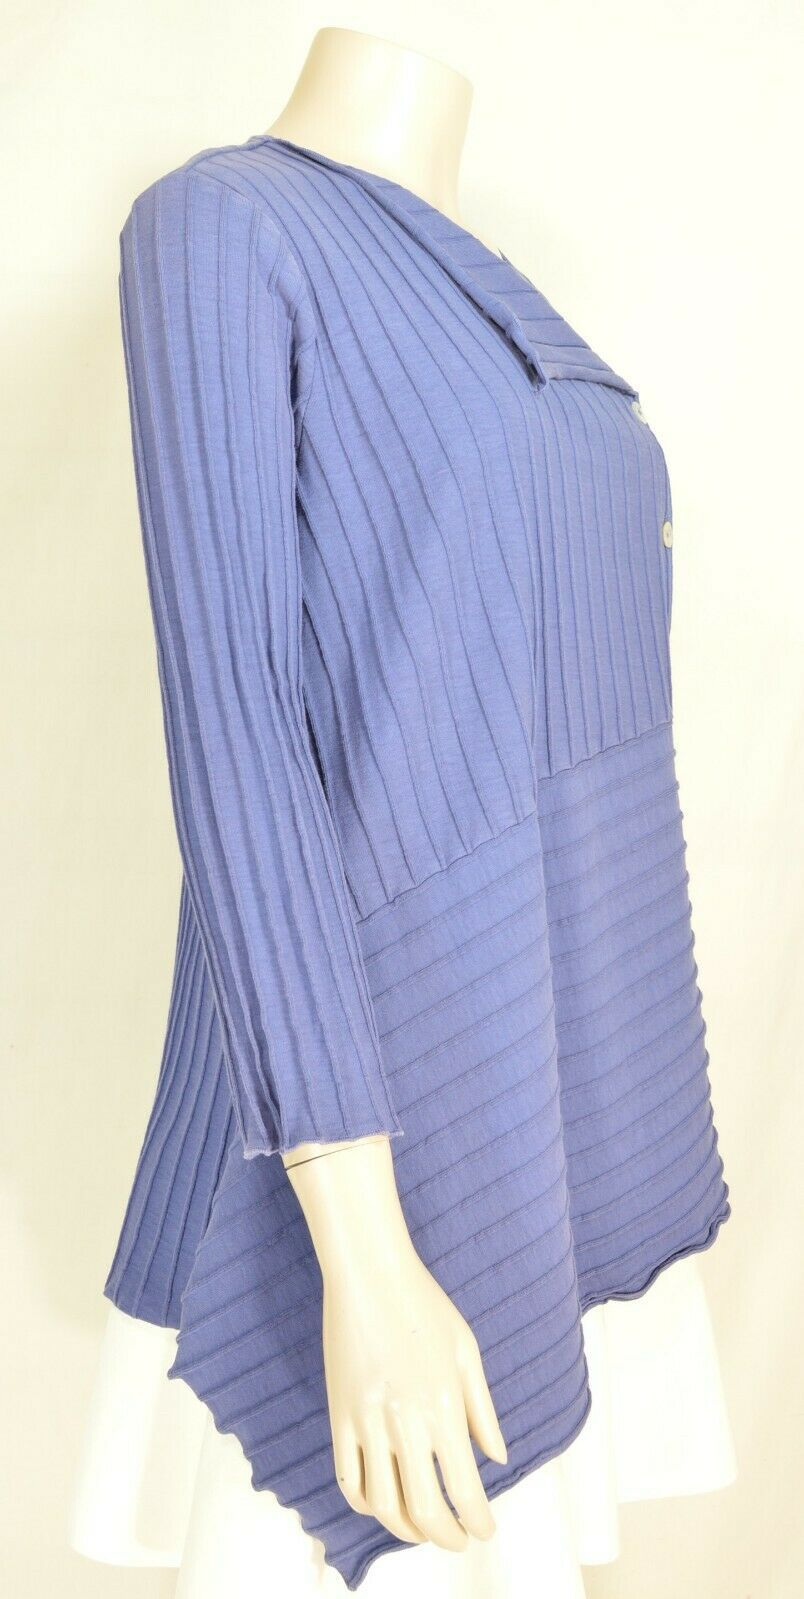 Fenini top jacket SZ S blue asymmetrical ribbed 100% cotton USA